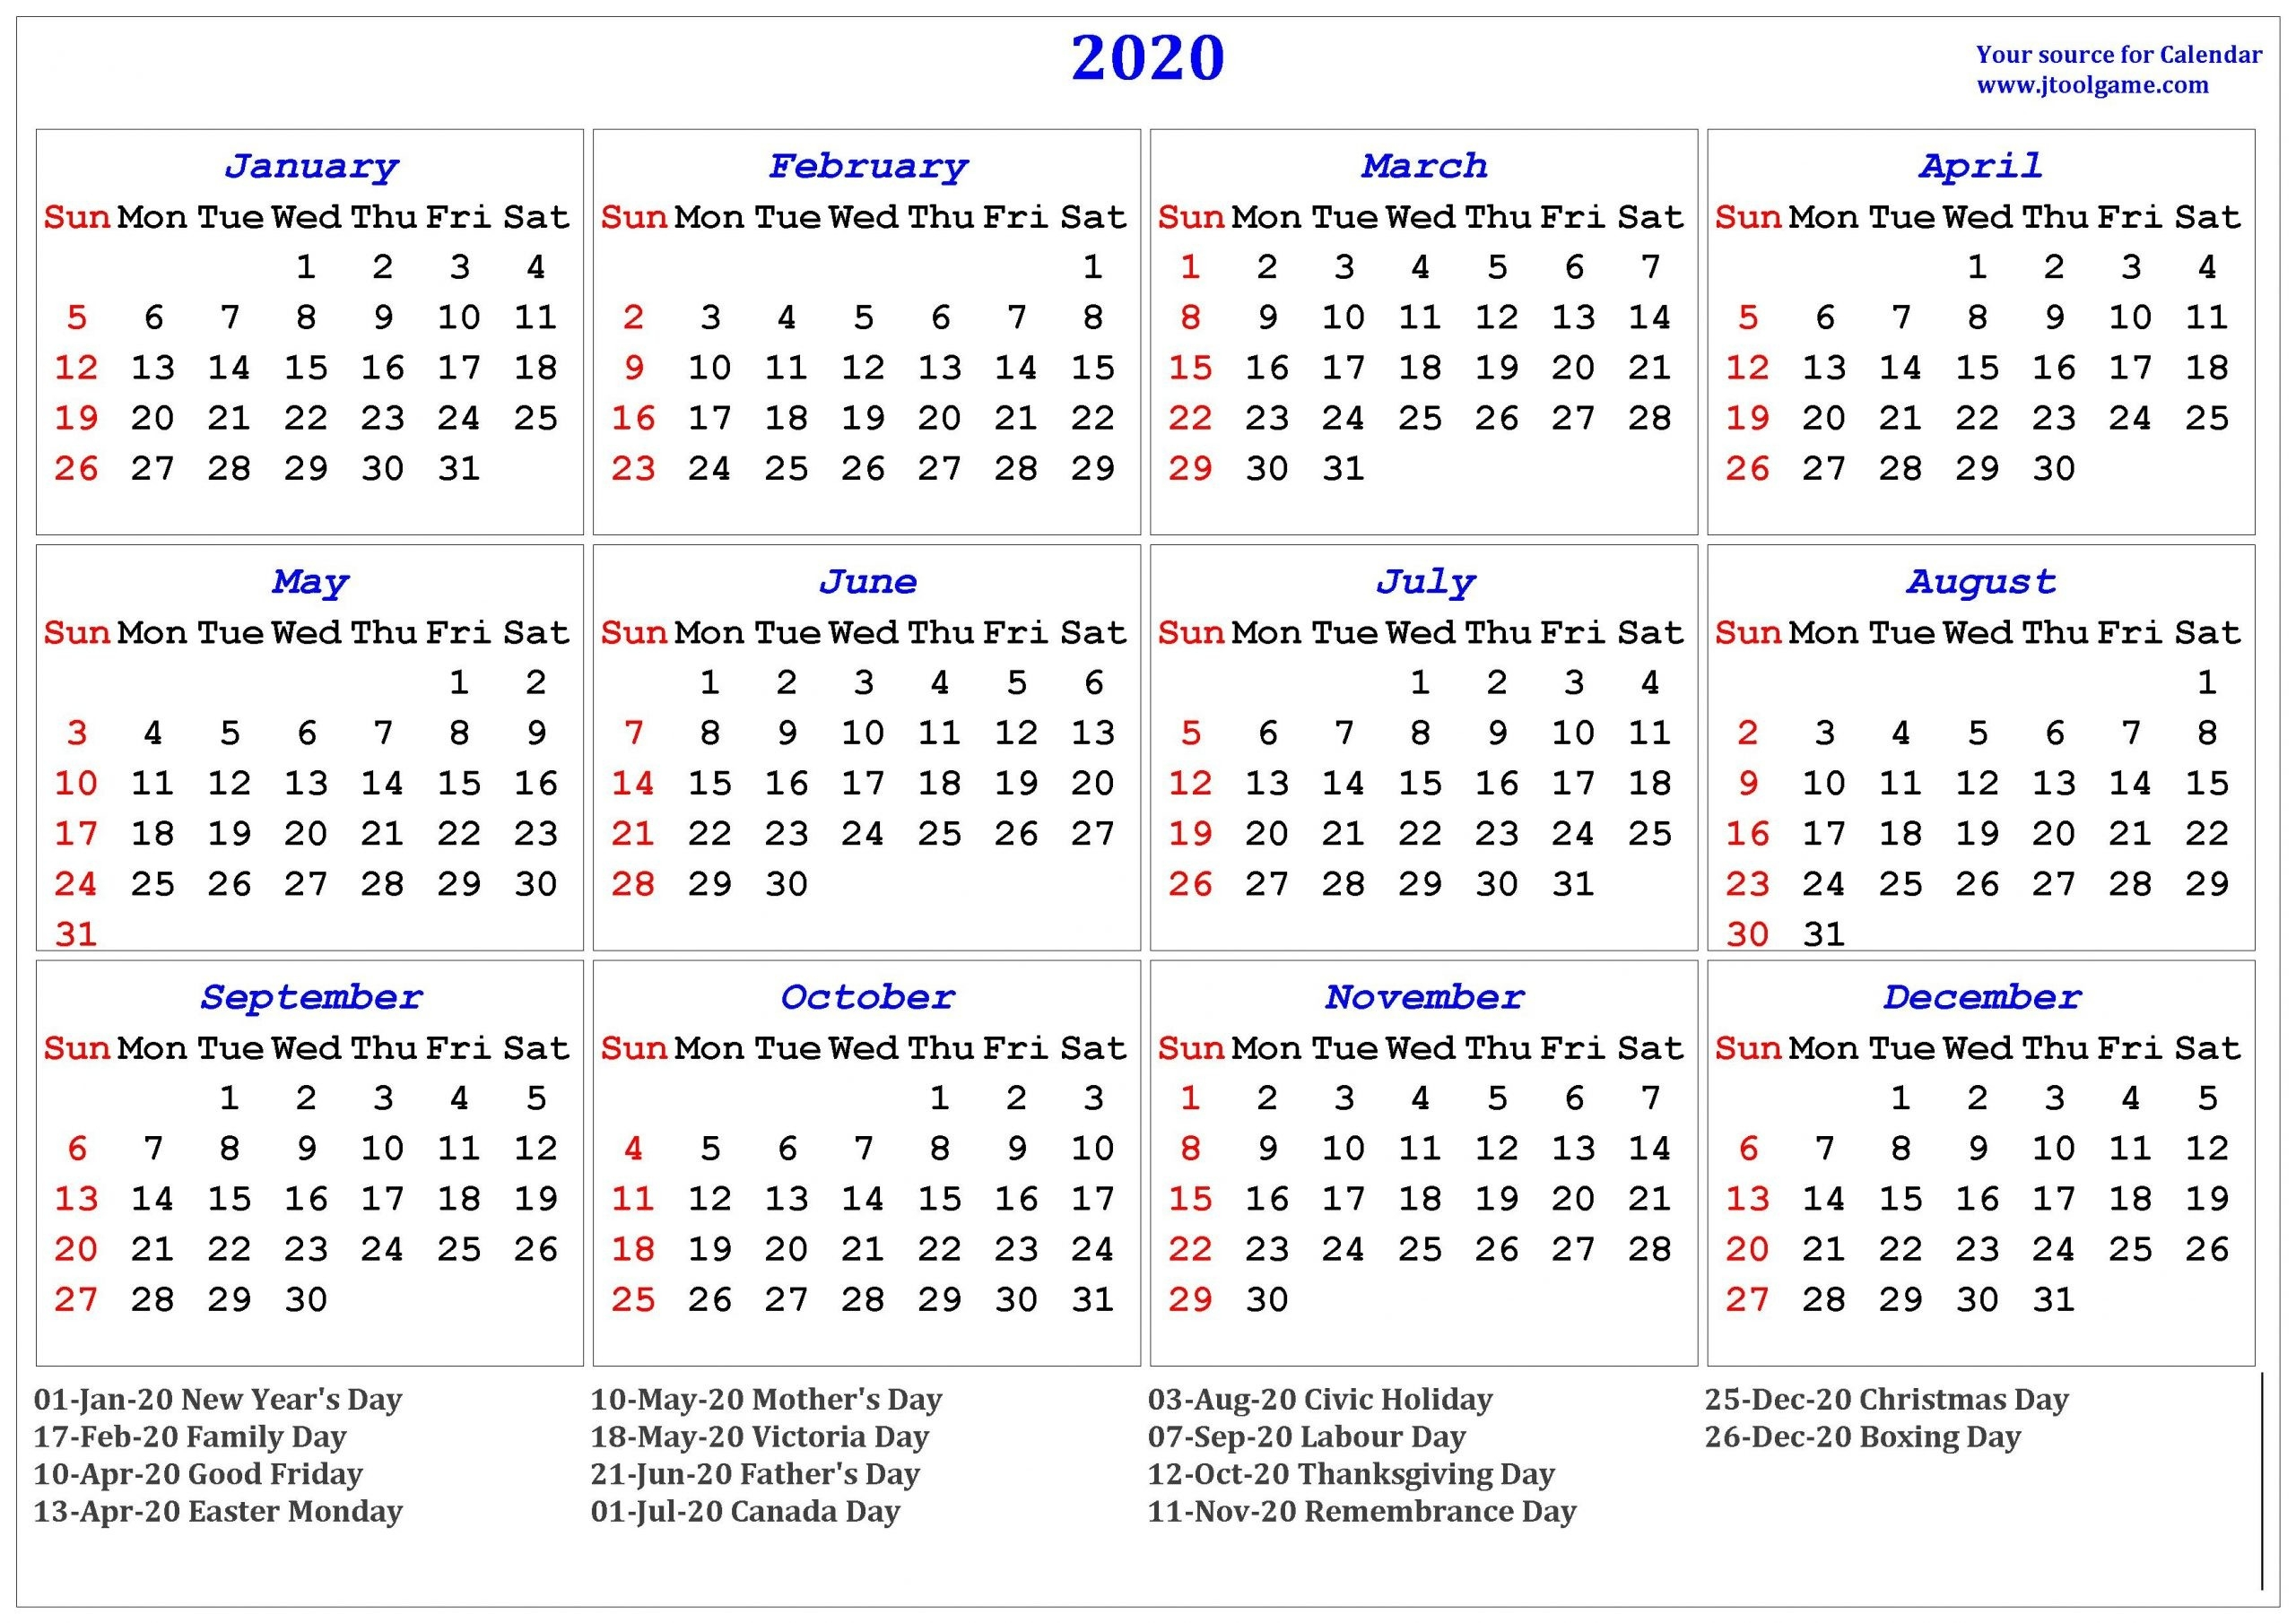 Get 2020 Calendar Printable One Page | Calendar Printables Free Blank-Blank I 9 Form 2021